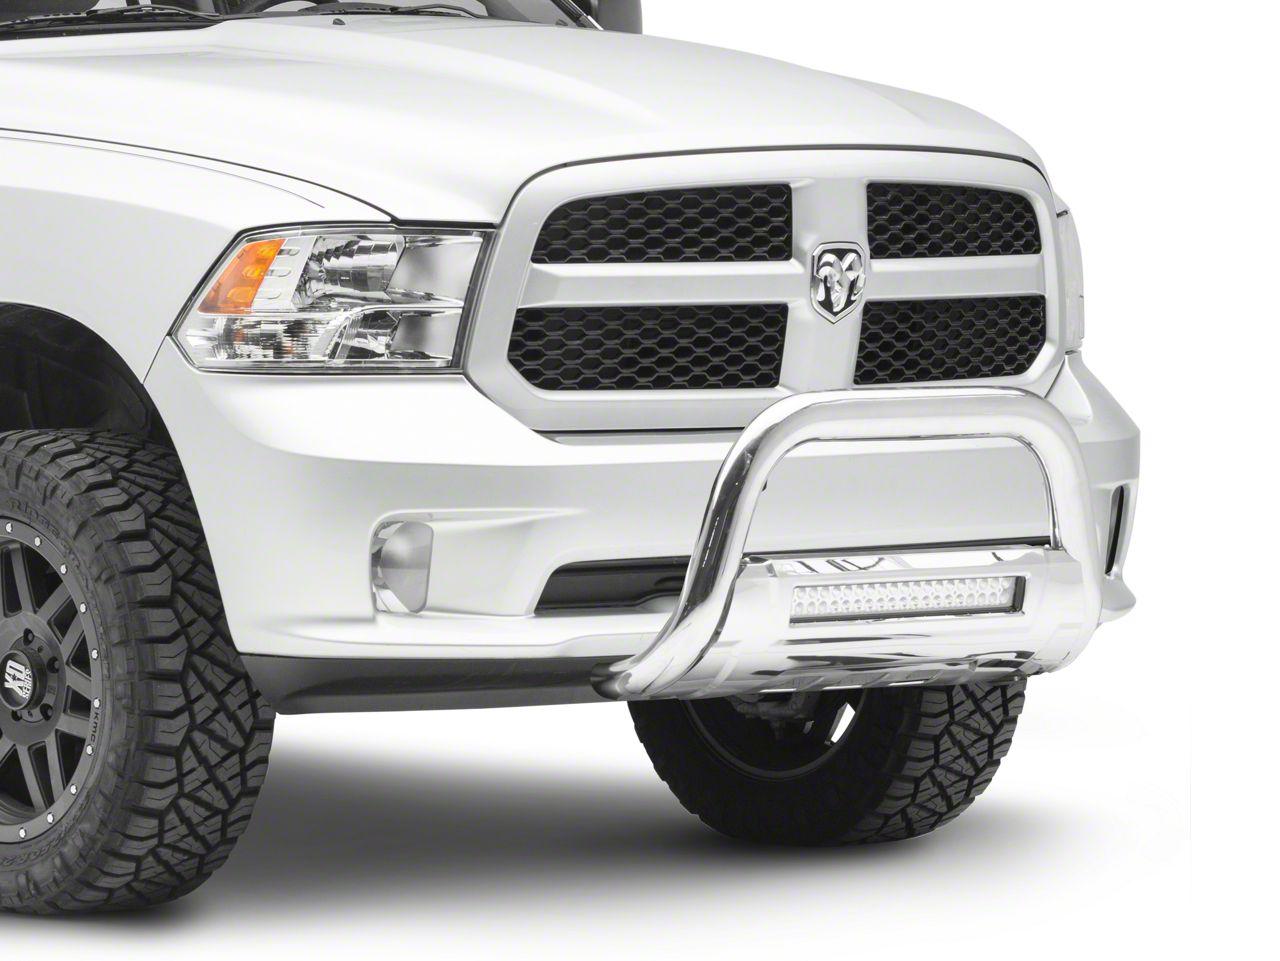 Fits Chevy Silverado 1500 Future Trucks Bull Bar High Grade Steel Construction with Skid Plate /& LED Light 2014-18 Chrome